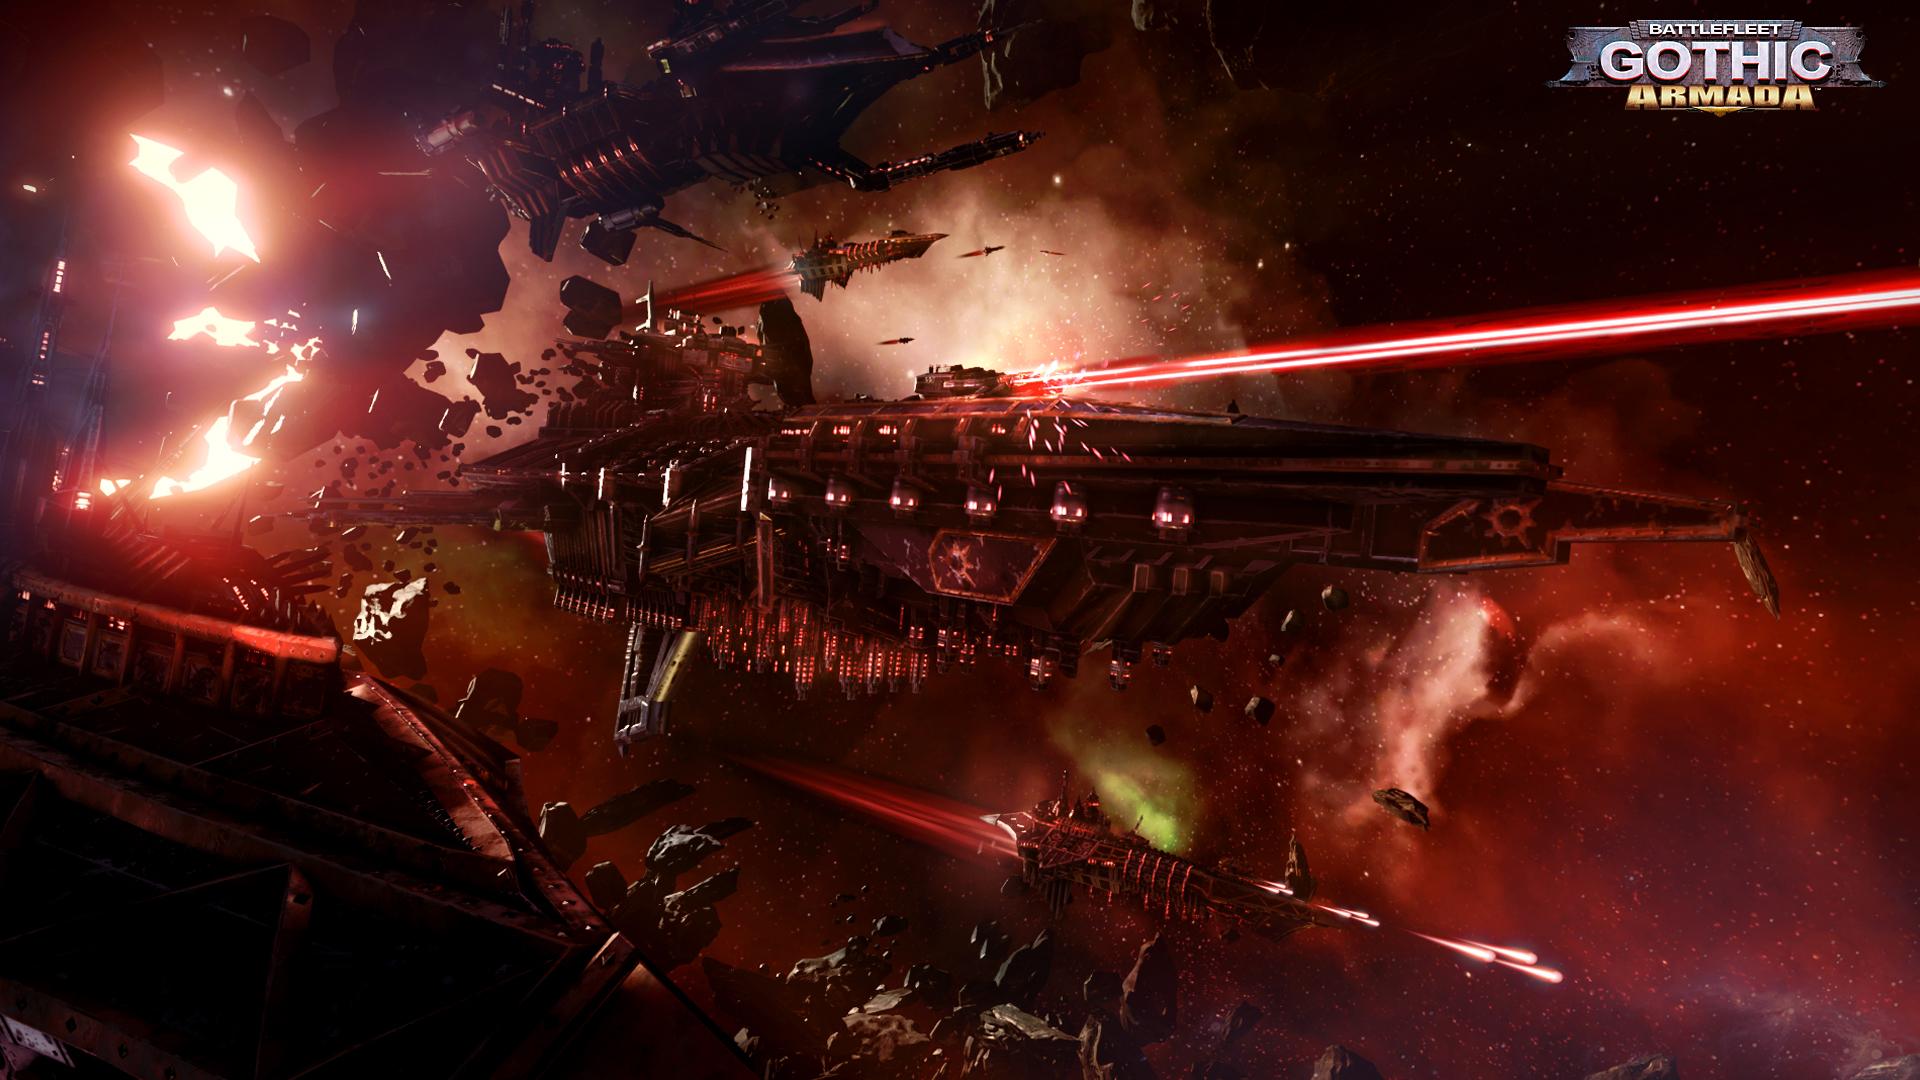 [Jeu vidéo] Battlefleet Gothic : Armada - Page 2 1433846605-5754-capture-d-ecran-pc